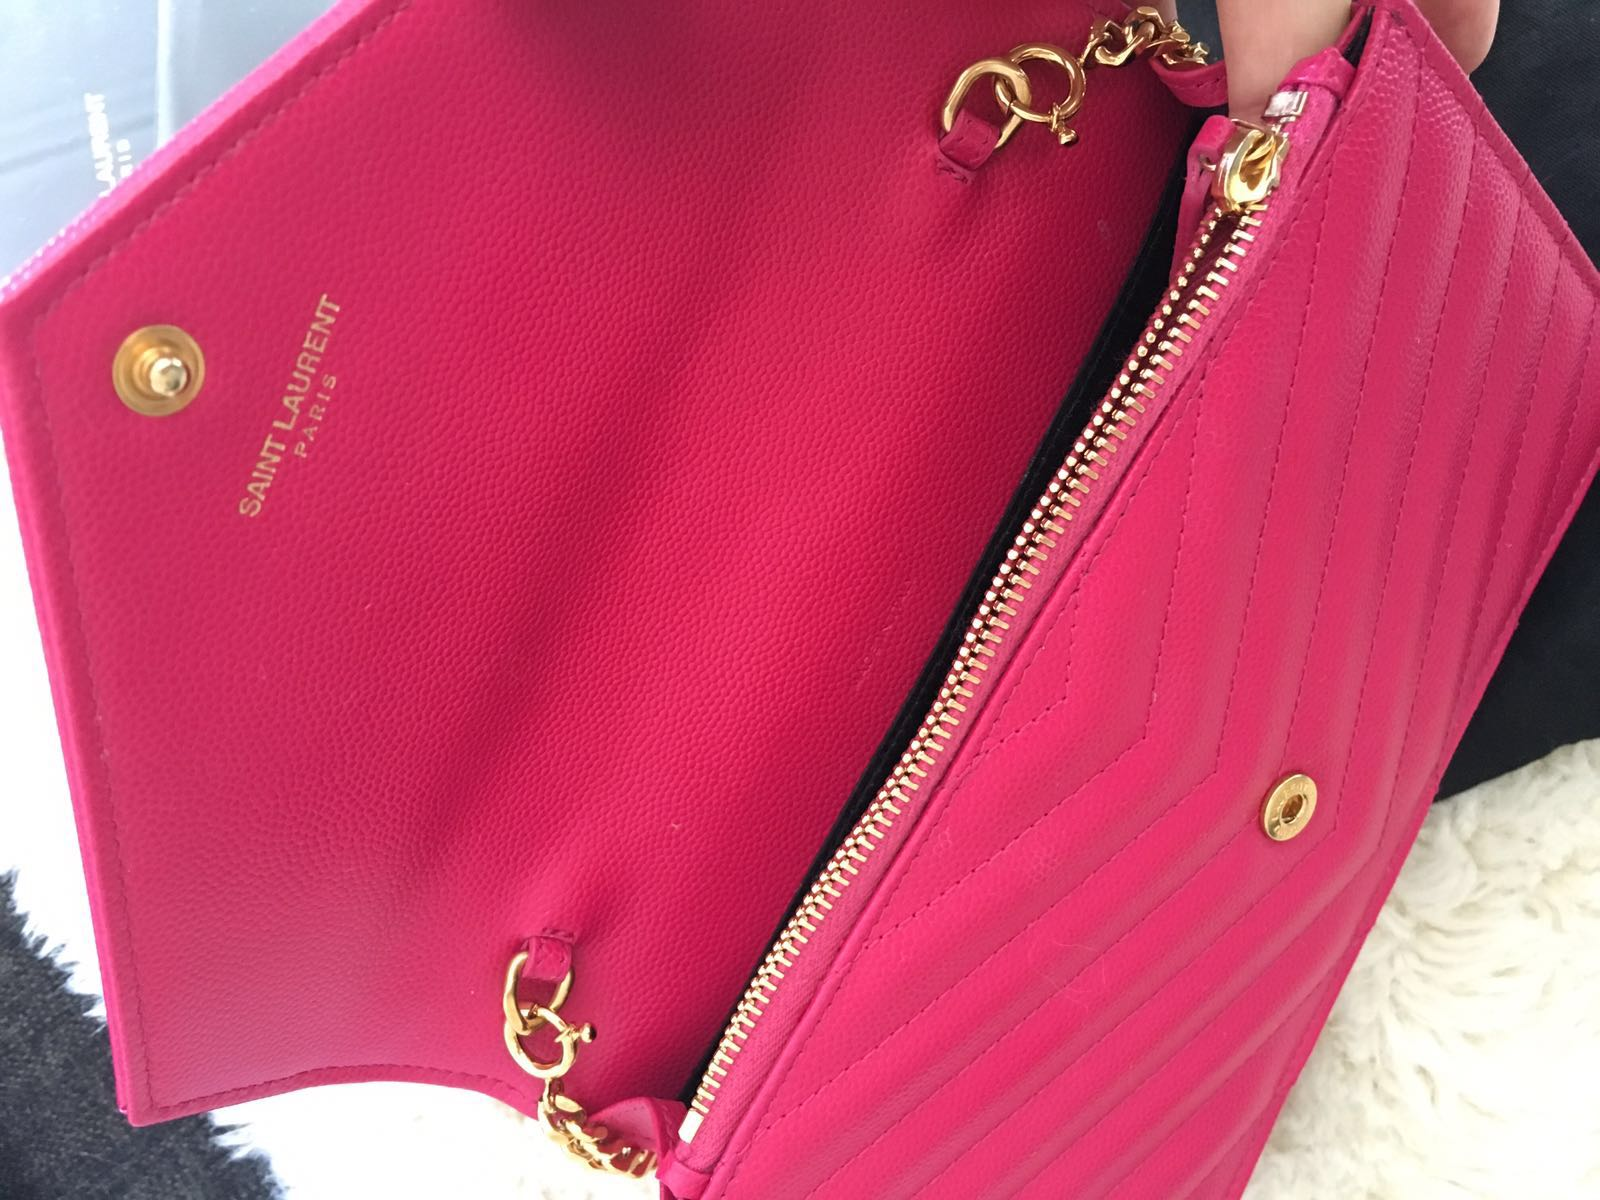 lightbox · lightbox · lightbox. prev. next. Yves Saint Laurent Paris YSL  Pink Leather Wallet on Chain GHW Shoulder Bag Purse Lust4Labels 12 08ae72d3424da